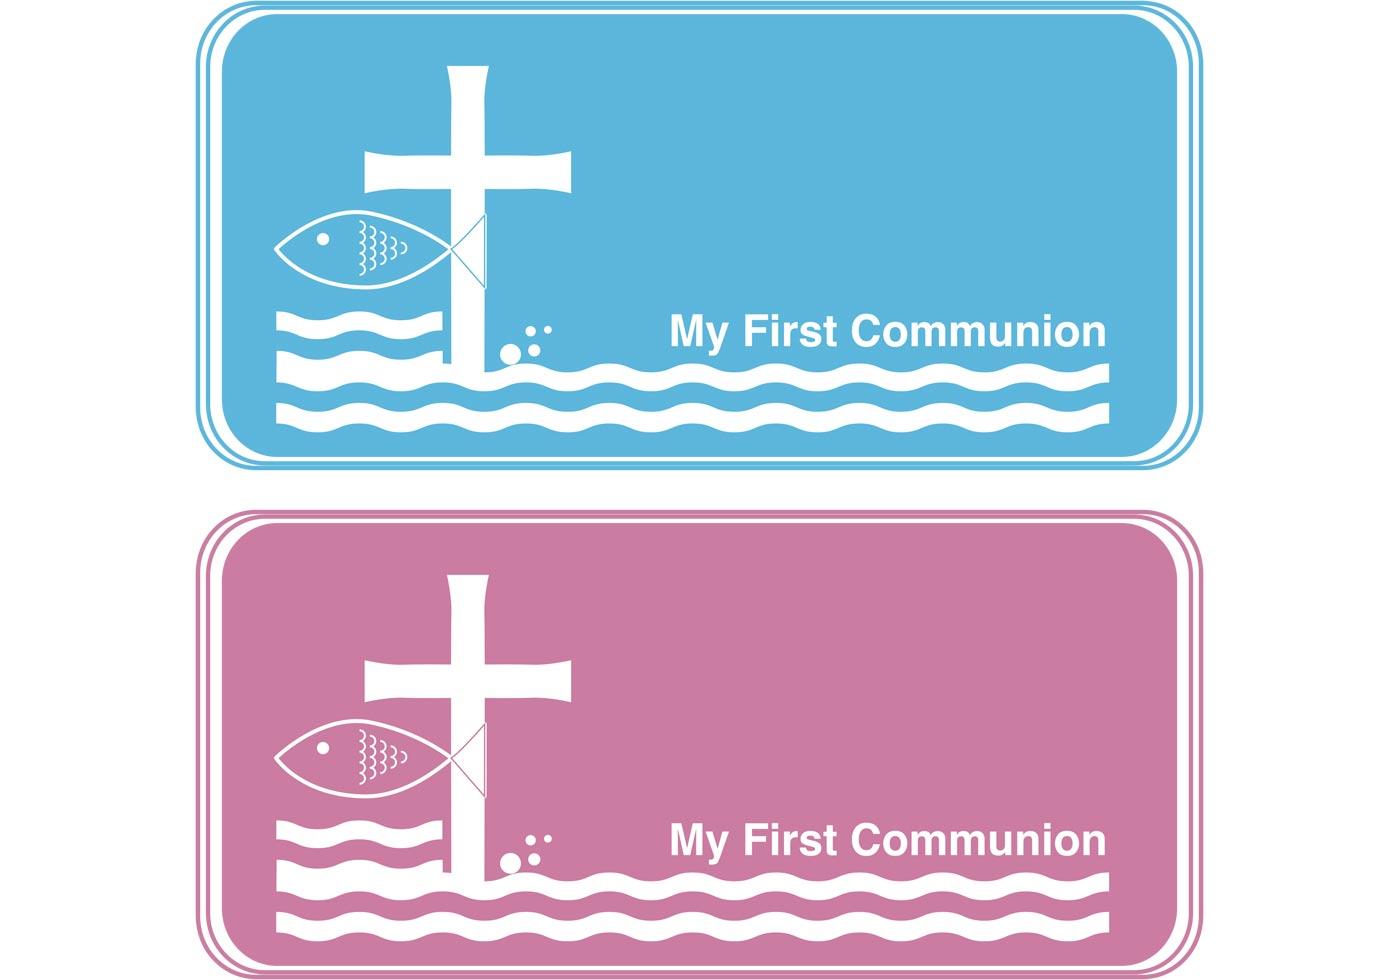 First Communion Banner Vectors 20 Vector Art at Vecteezy Pertaining To First Communion Banner Templates